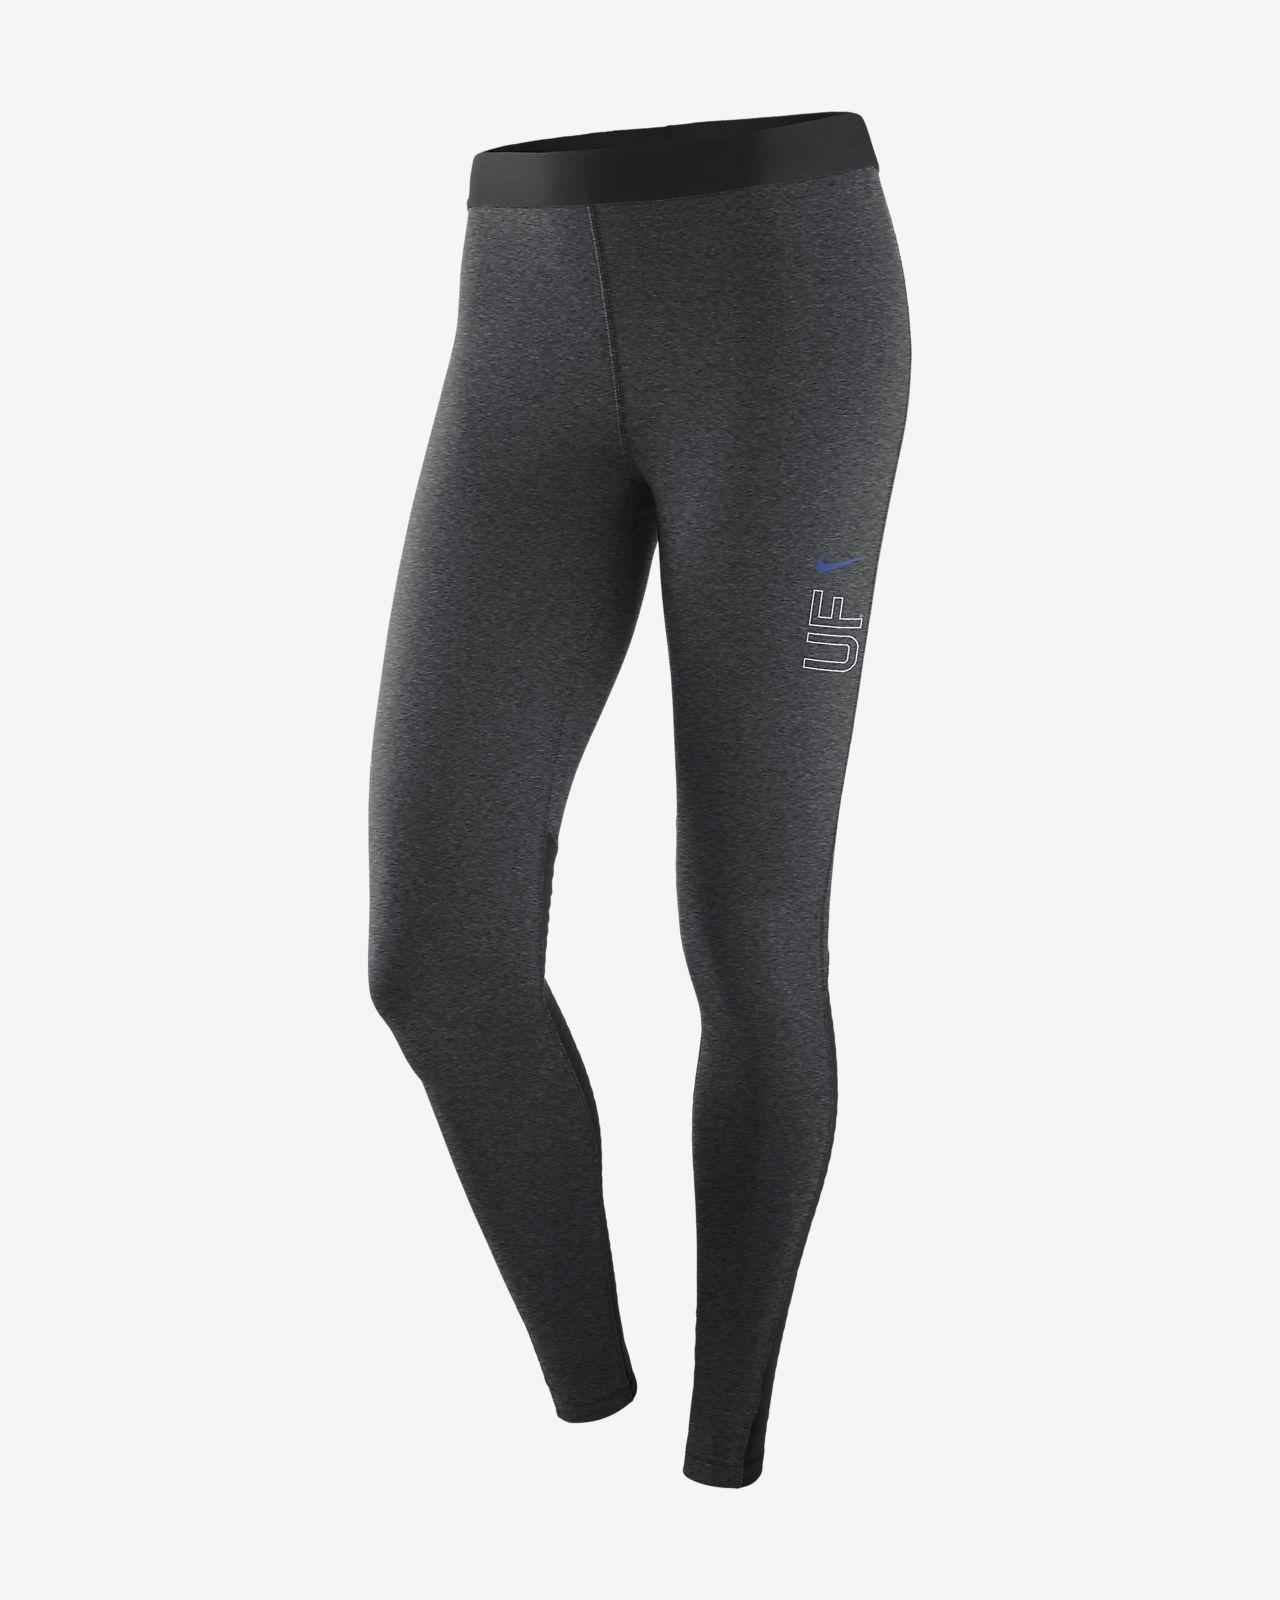 Nike College Pro Warm (Florida) Women's Tights